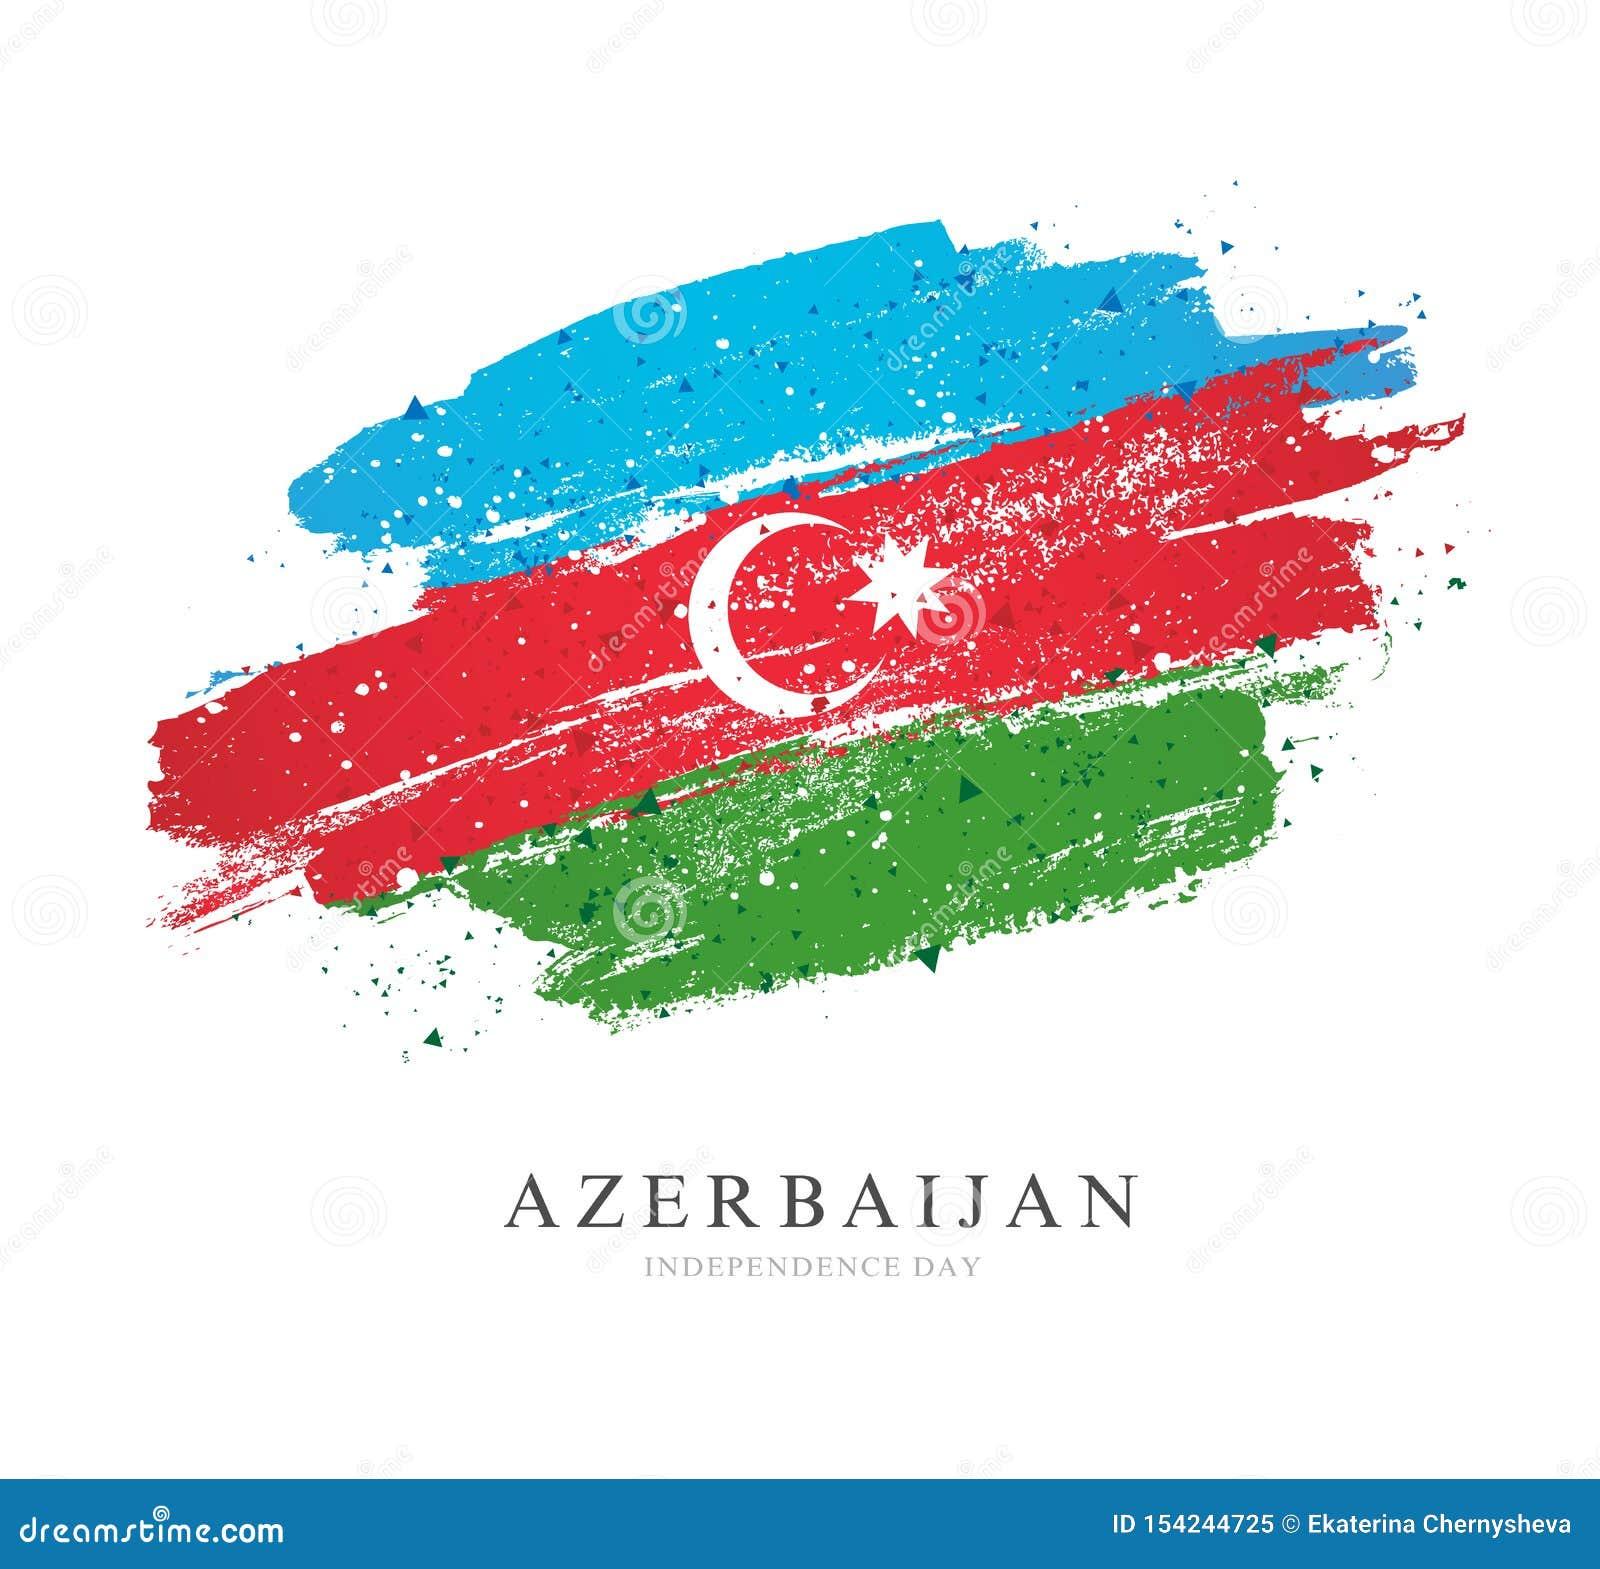 Azerbaijan Stock Illustrationen Vektors Klipart 9 492 Stock Illustrations